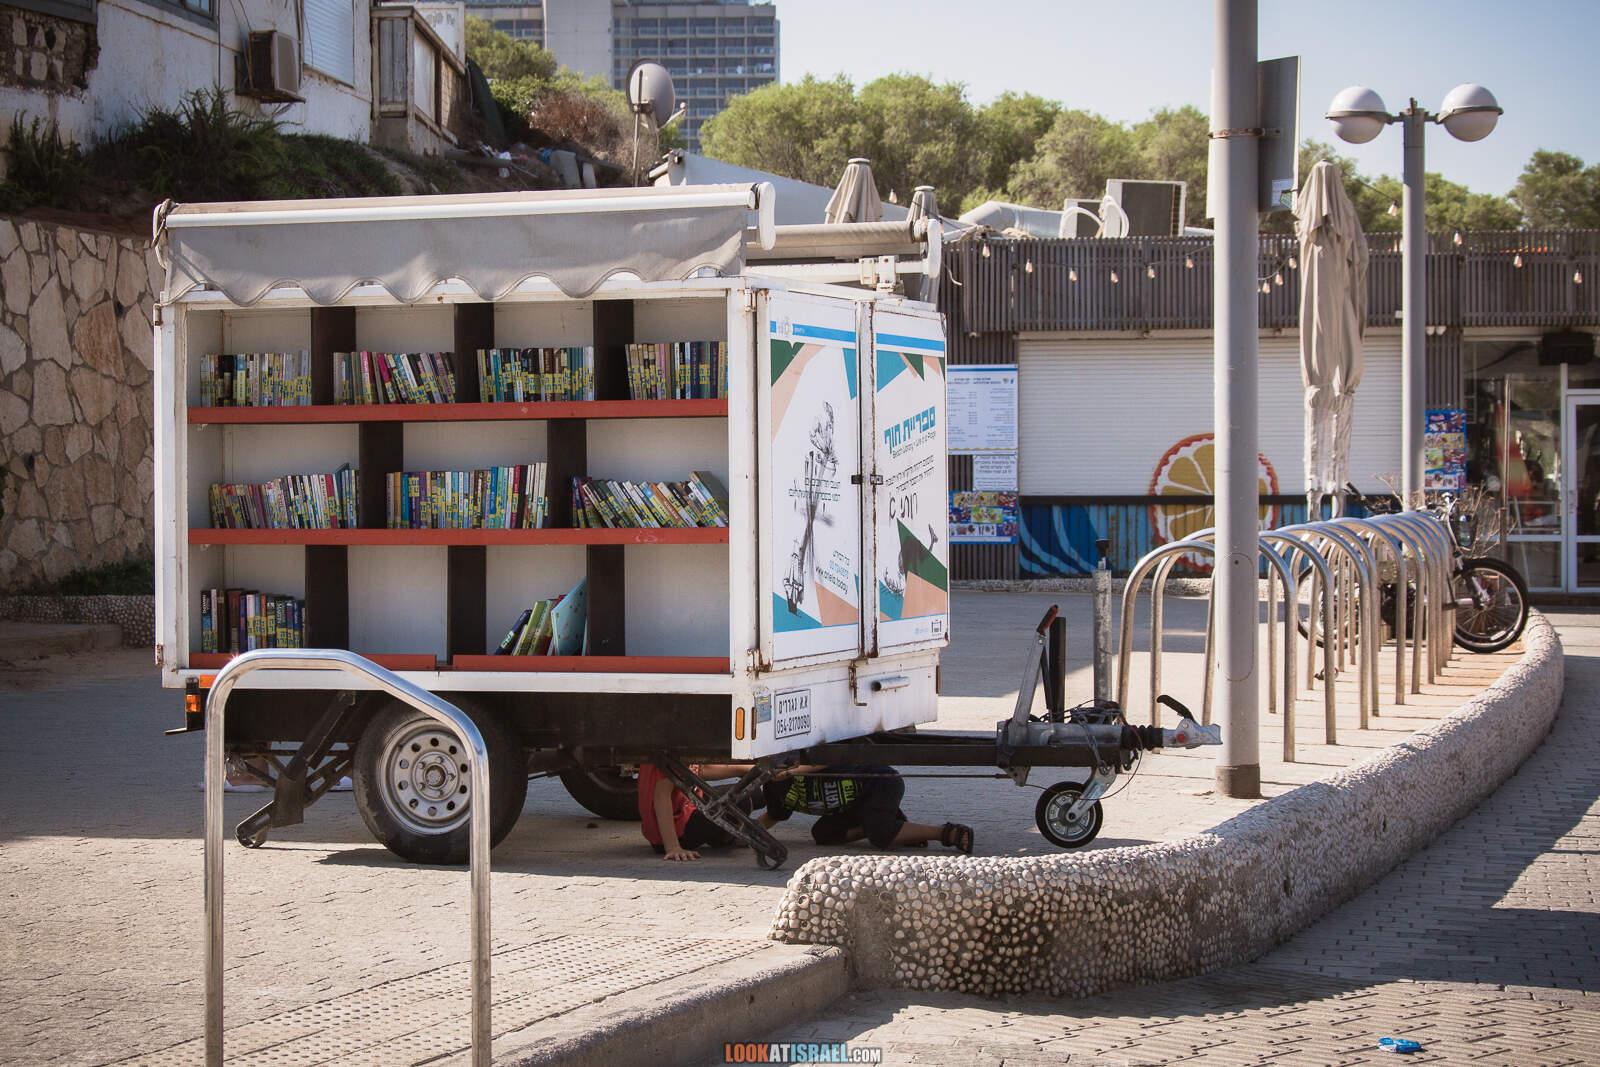 Пляжи и набережная Тель-Авива во время карантина | Lockdown on beaches of Tel Aviv | LookAtIsrael.com - Фото путешествия по Израилю